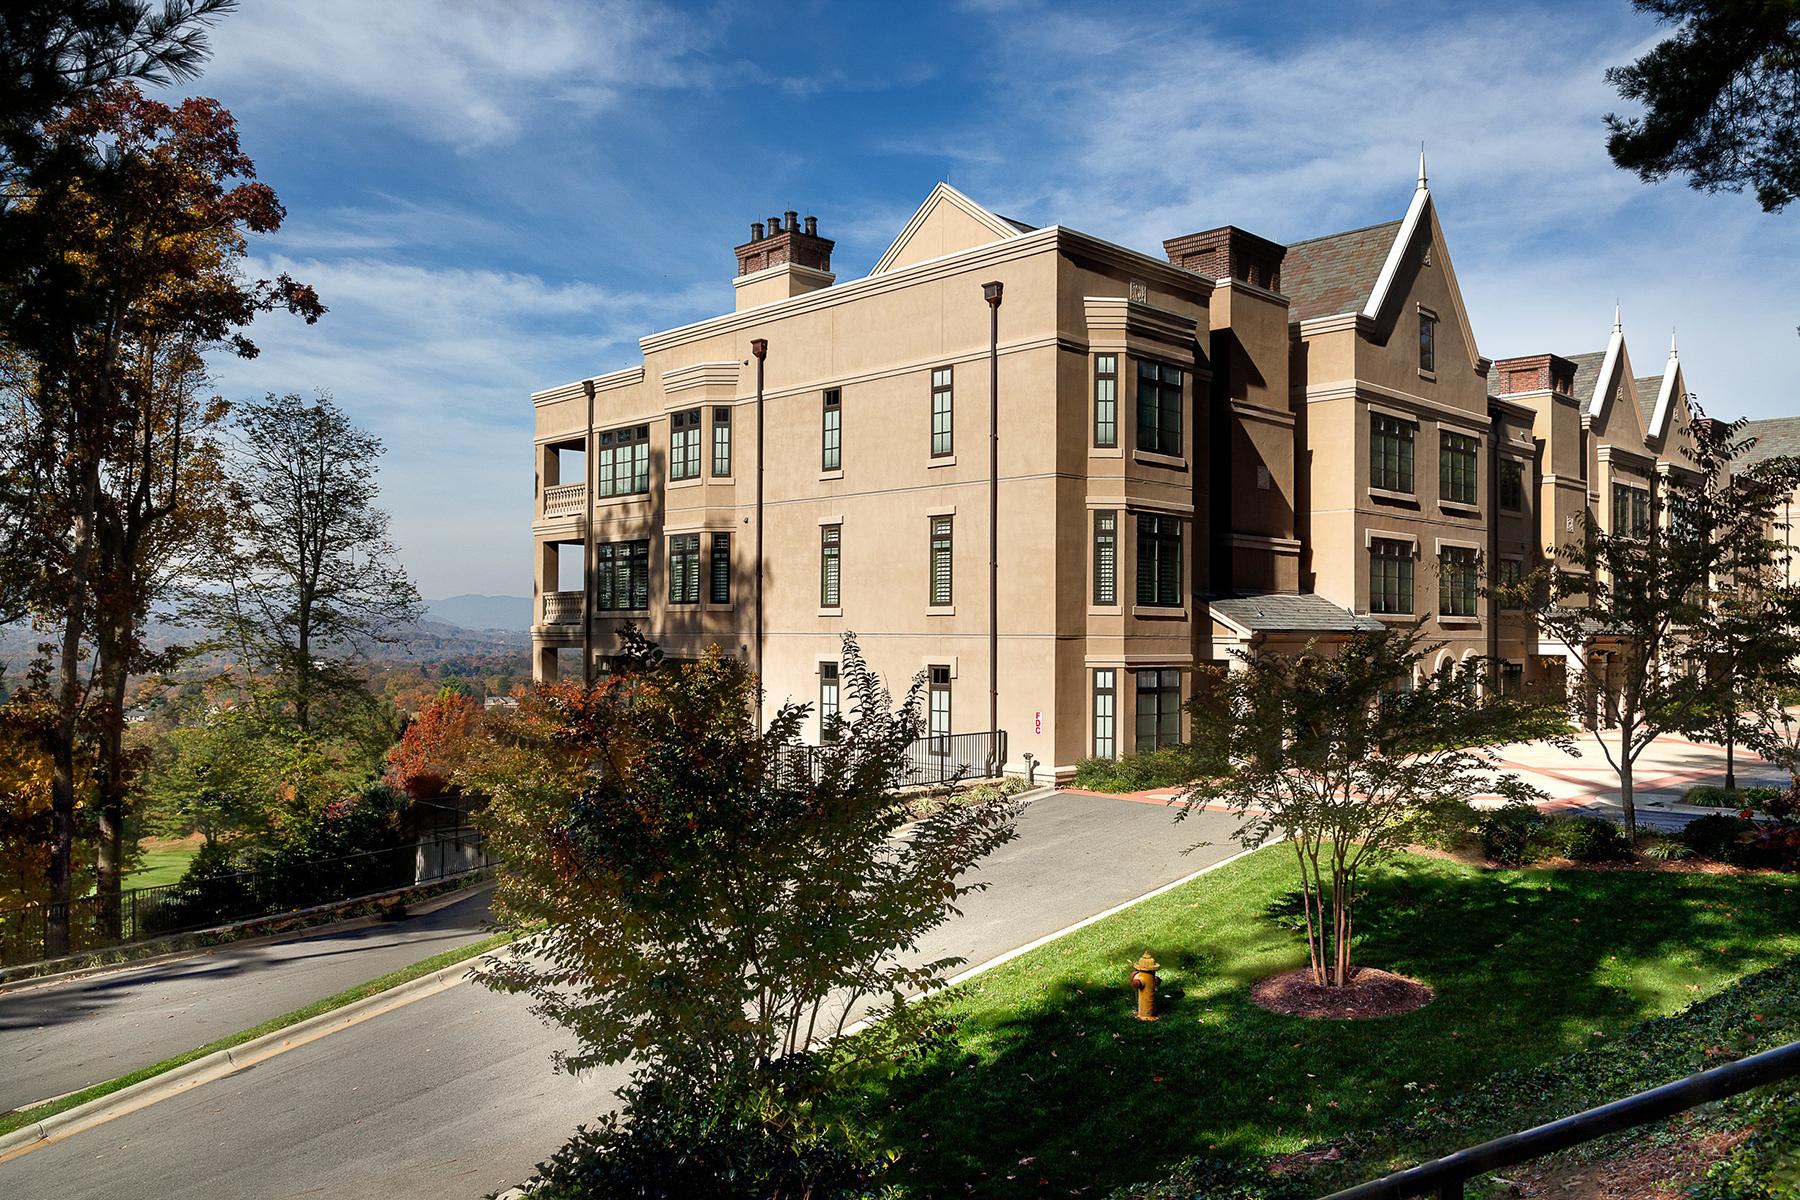 Condominium for Sale at THE FITZGERALD 288 Macon Ave Asheville, North Carolina, 28804 United States